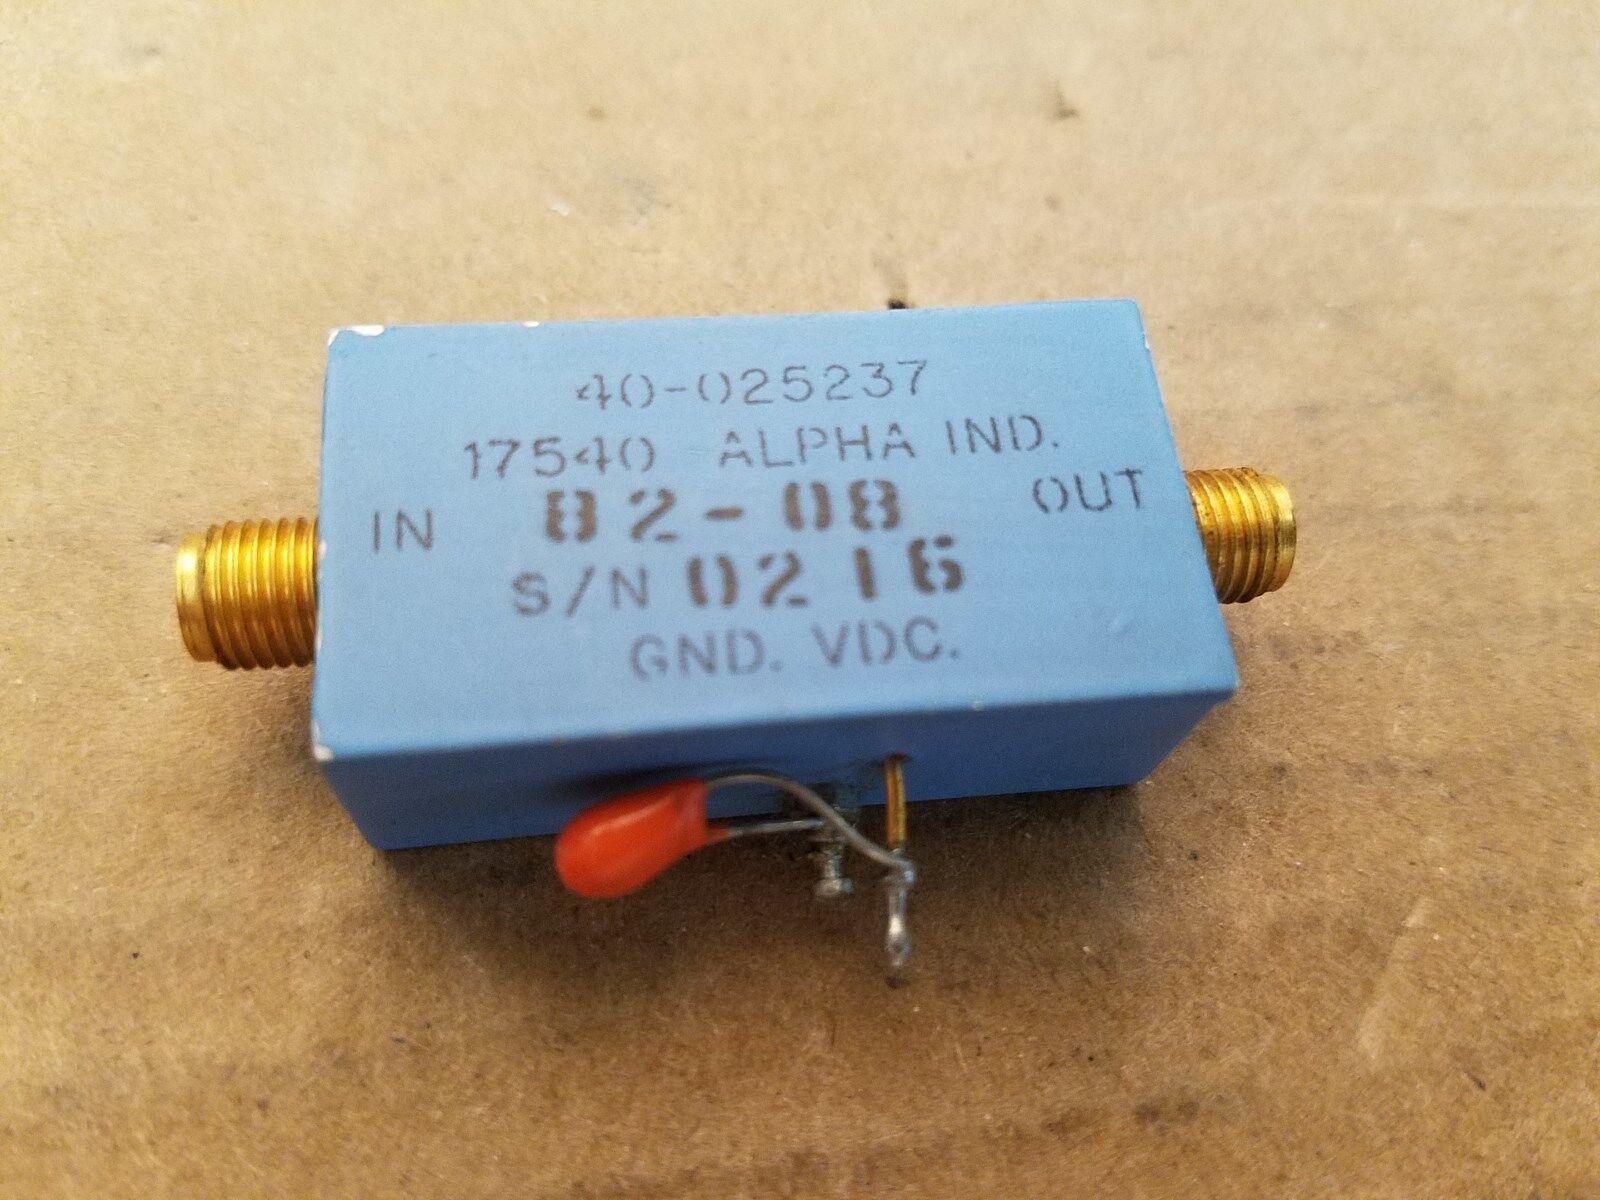 Alpha Industries 40-025237 RF Mikrowelle Verstärker 4.7-7.5GHz -12V SMA(F) #